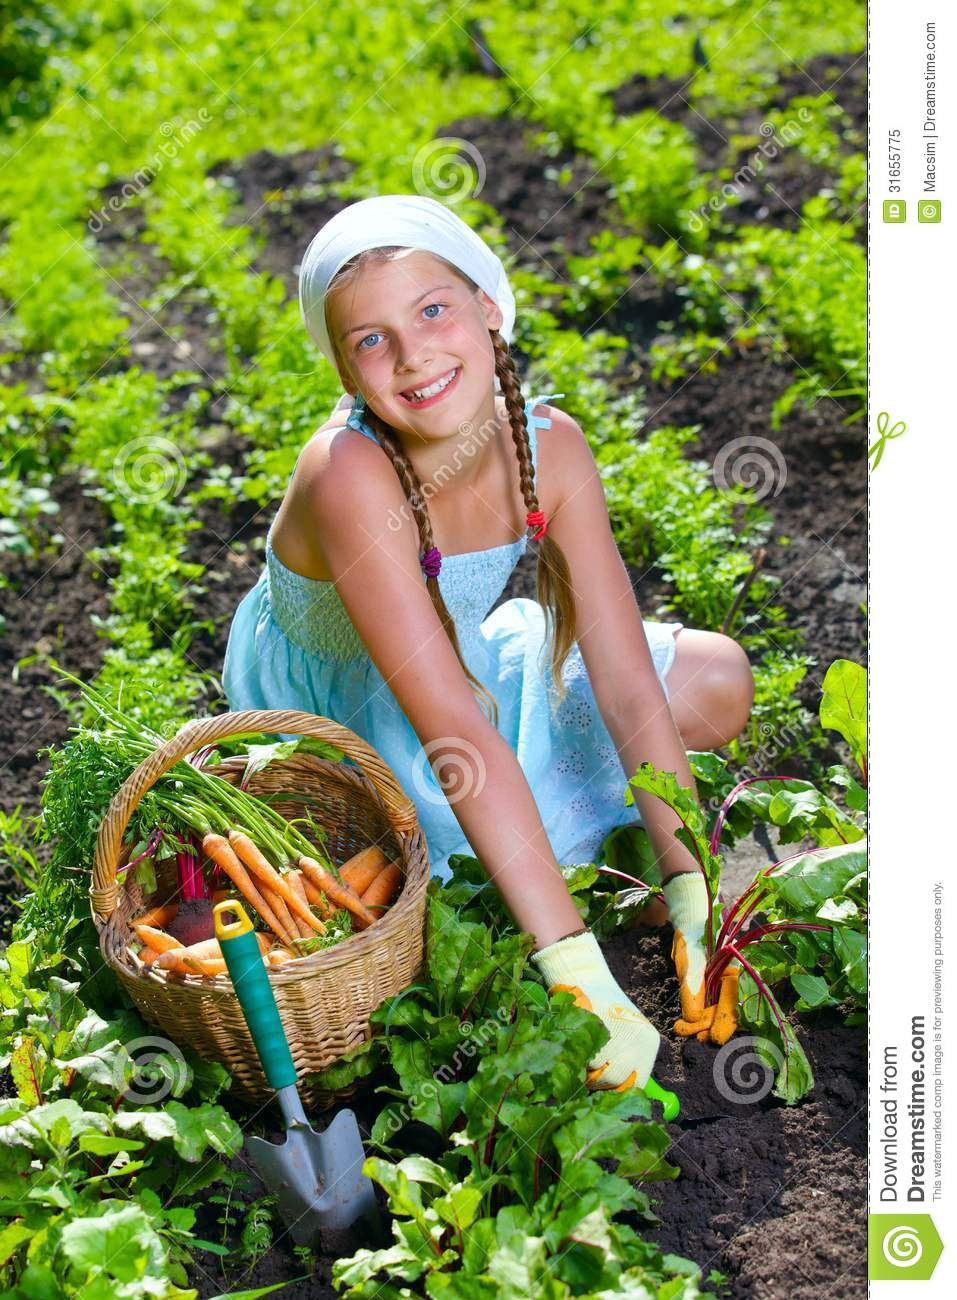 gardening-girl-vegetable-garden-little-gardener-collects-vegetables-basket-organ